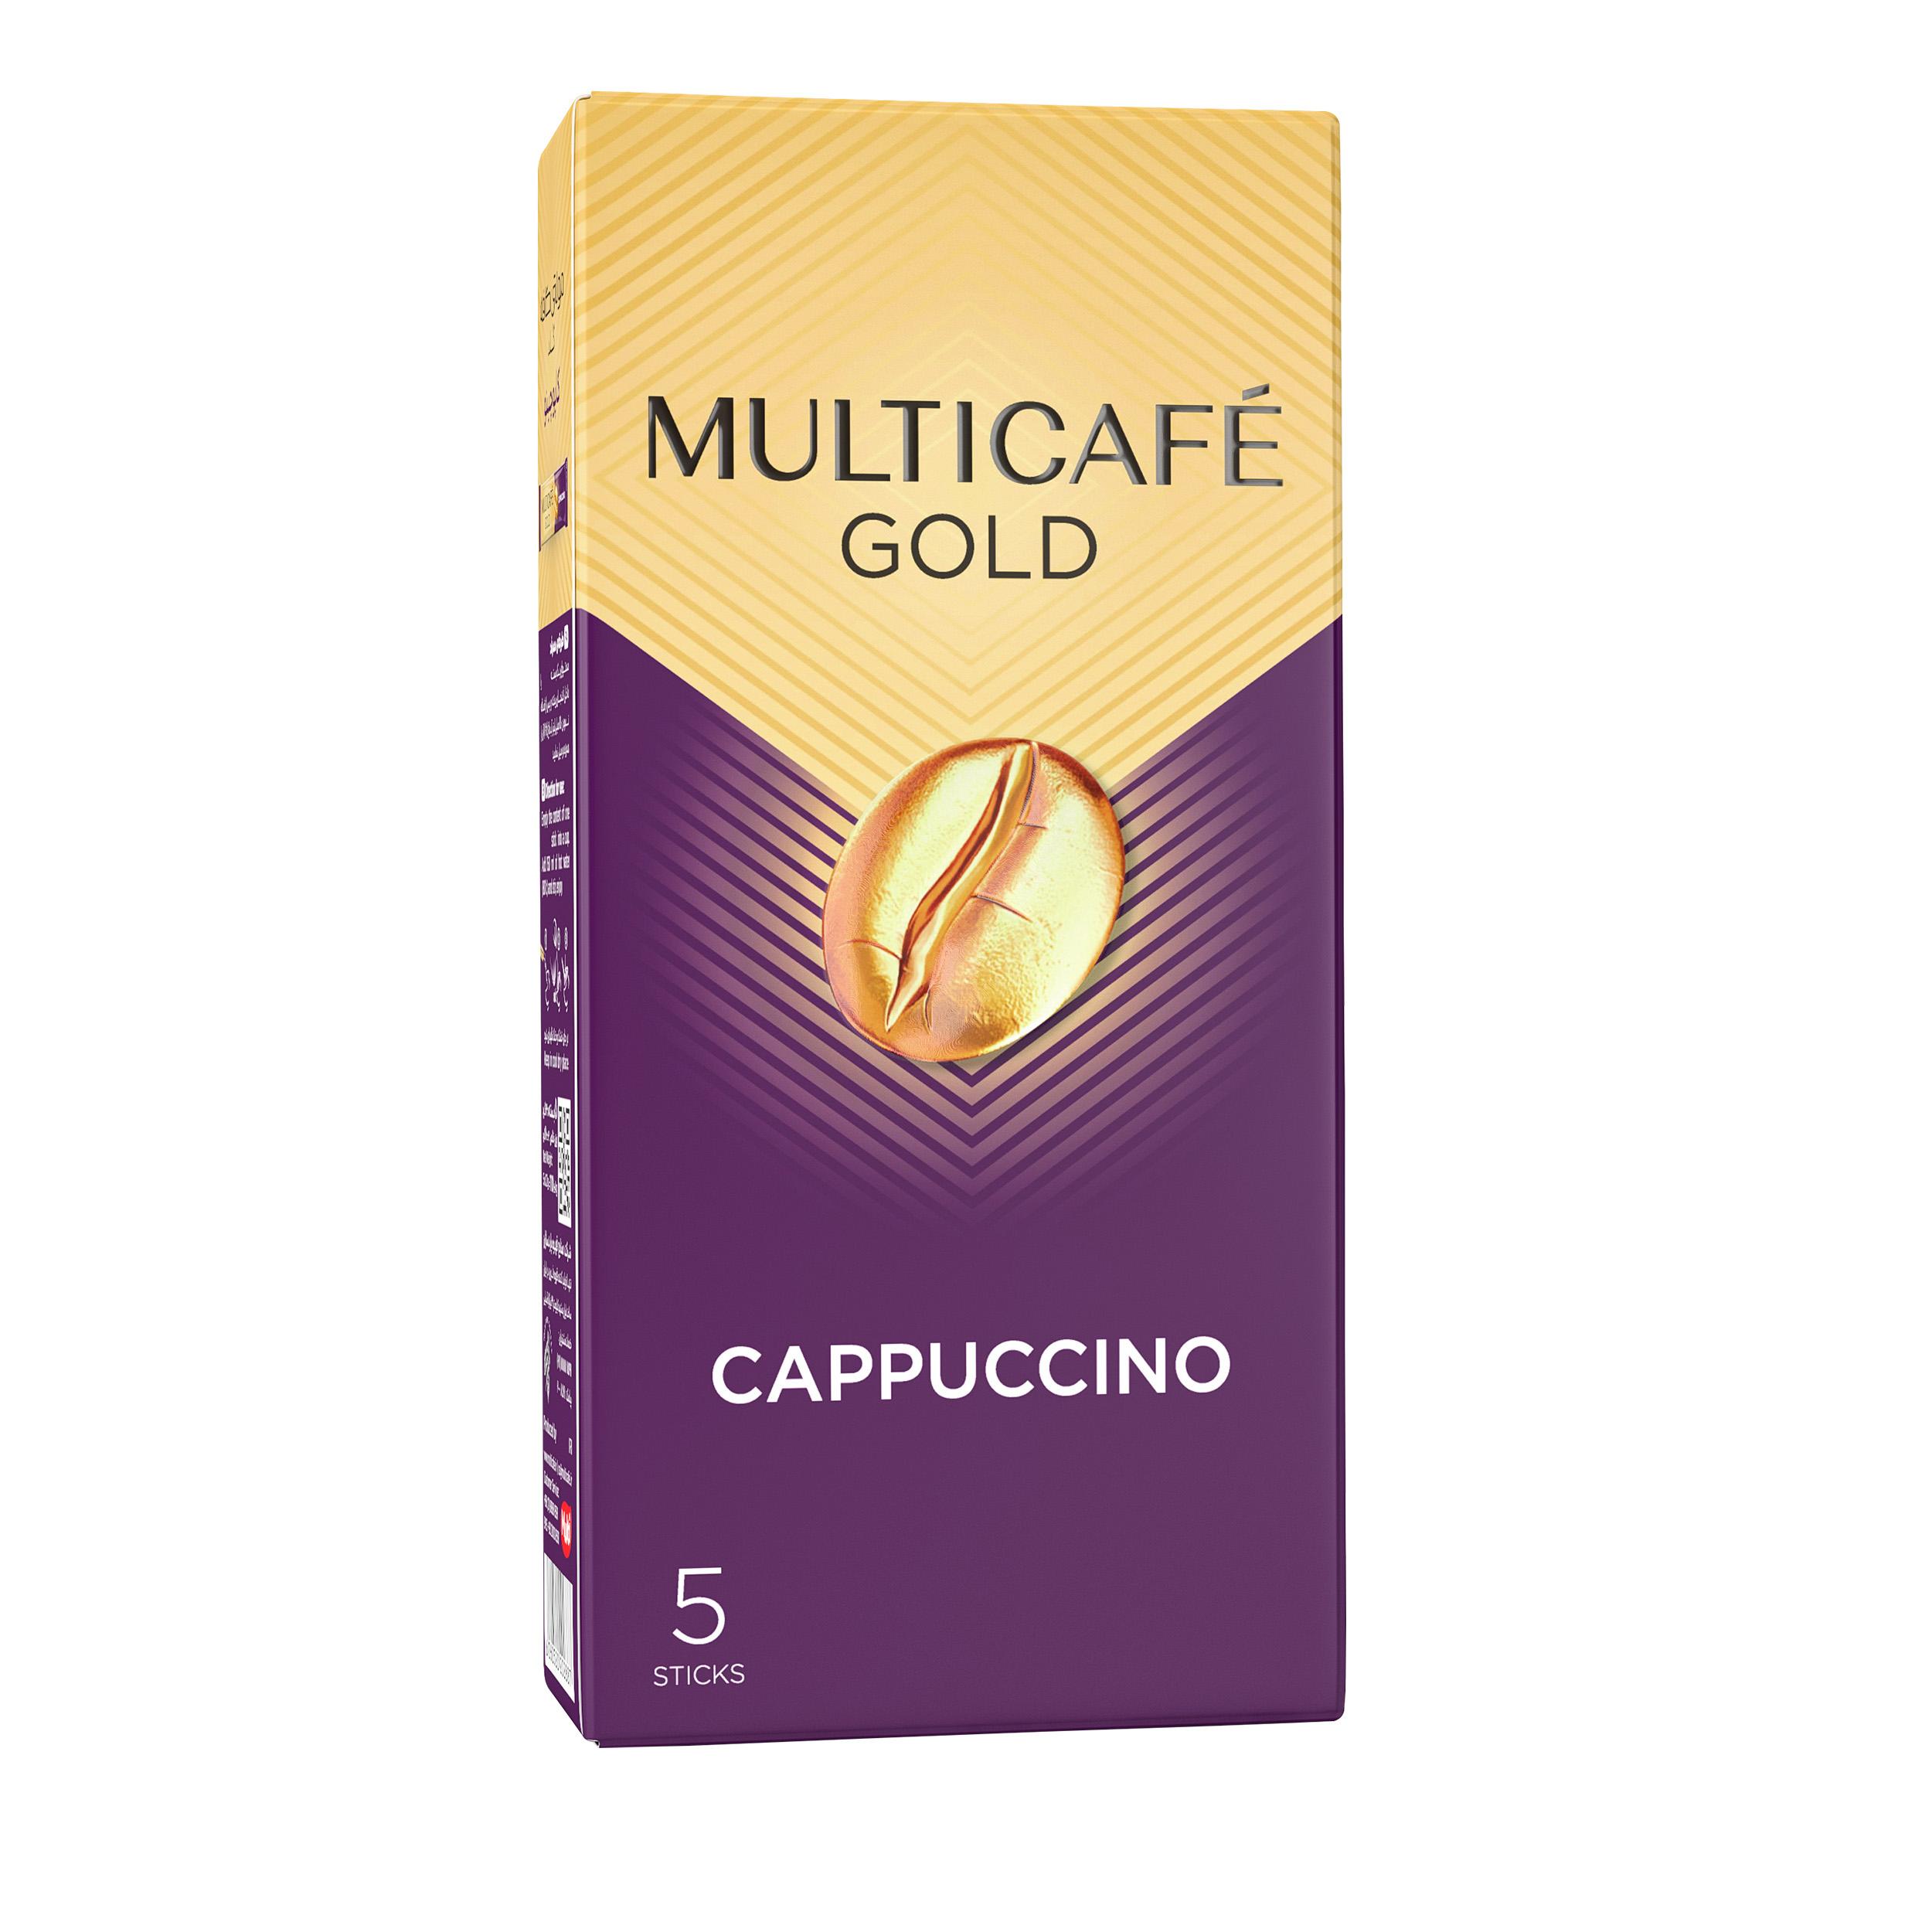 کاپوچینو گلد مولتی کافه بسته 5 عددی  main 1 2